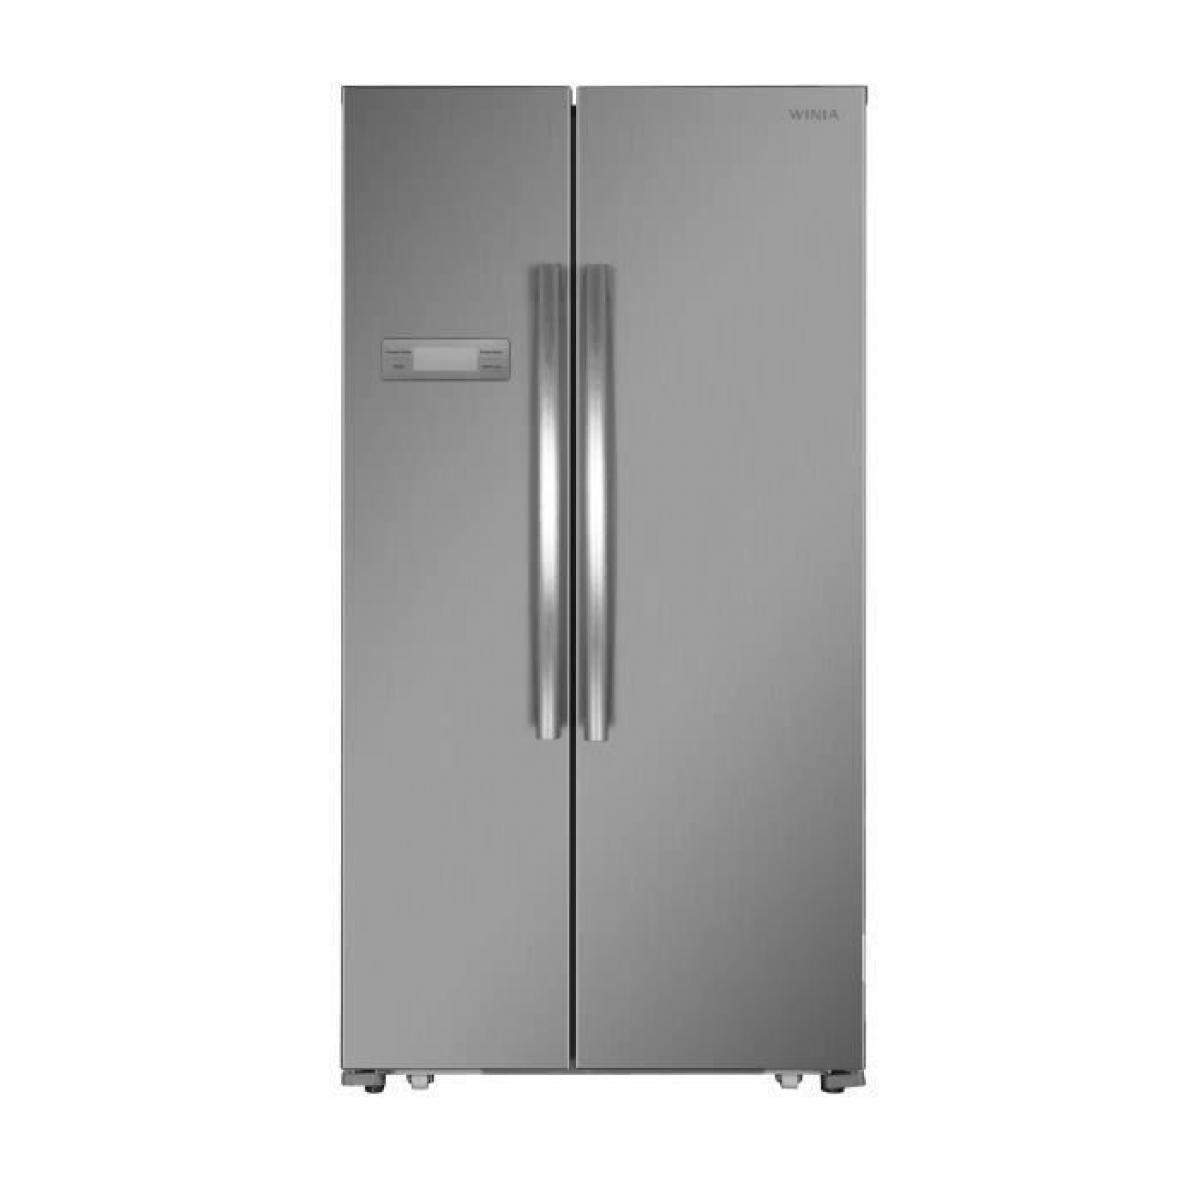 Daewoo Réfrigérateur américain 517L Froid Ventilé DAEWOO 90,5cm A+, WFRN-H540B2X